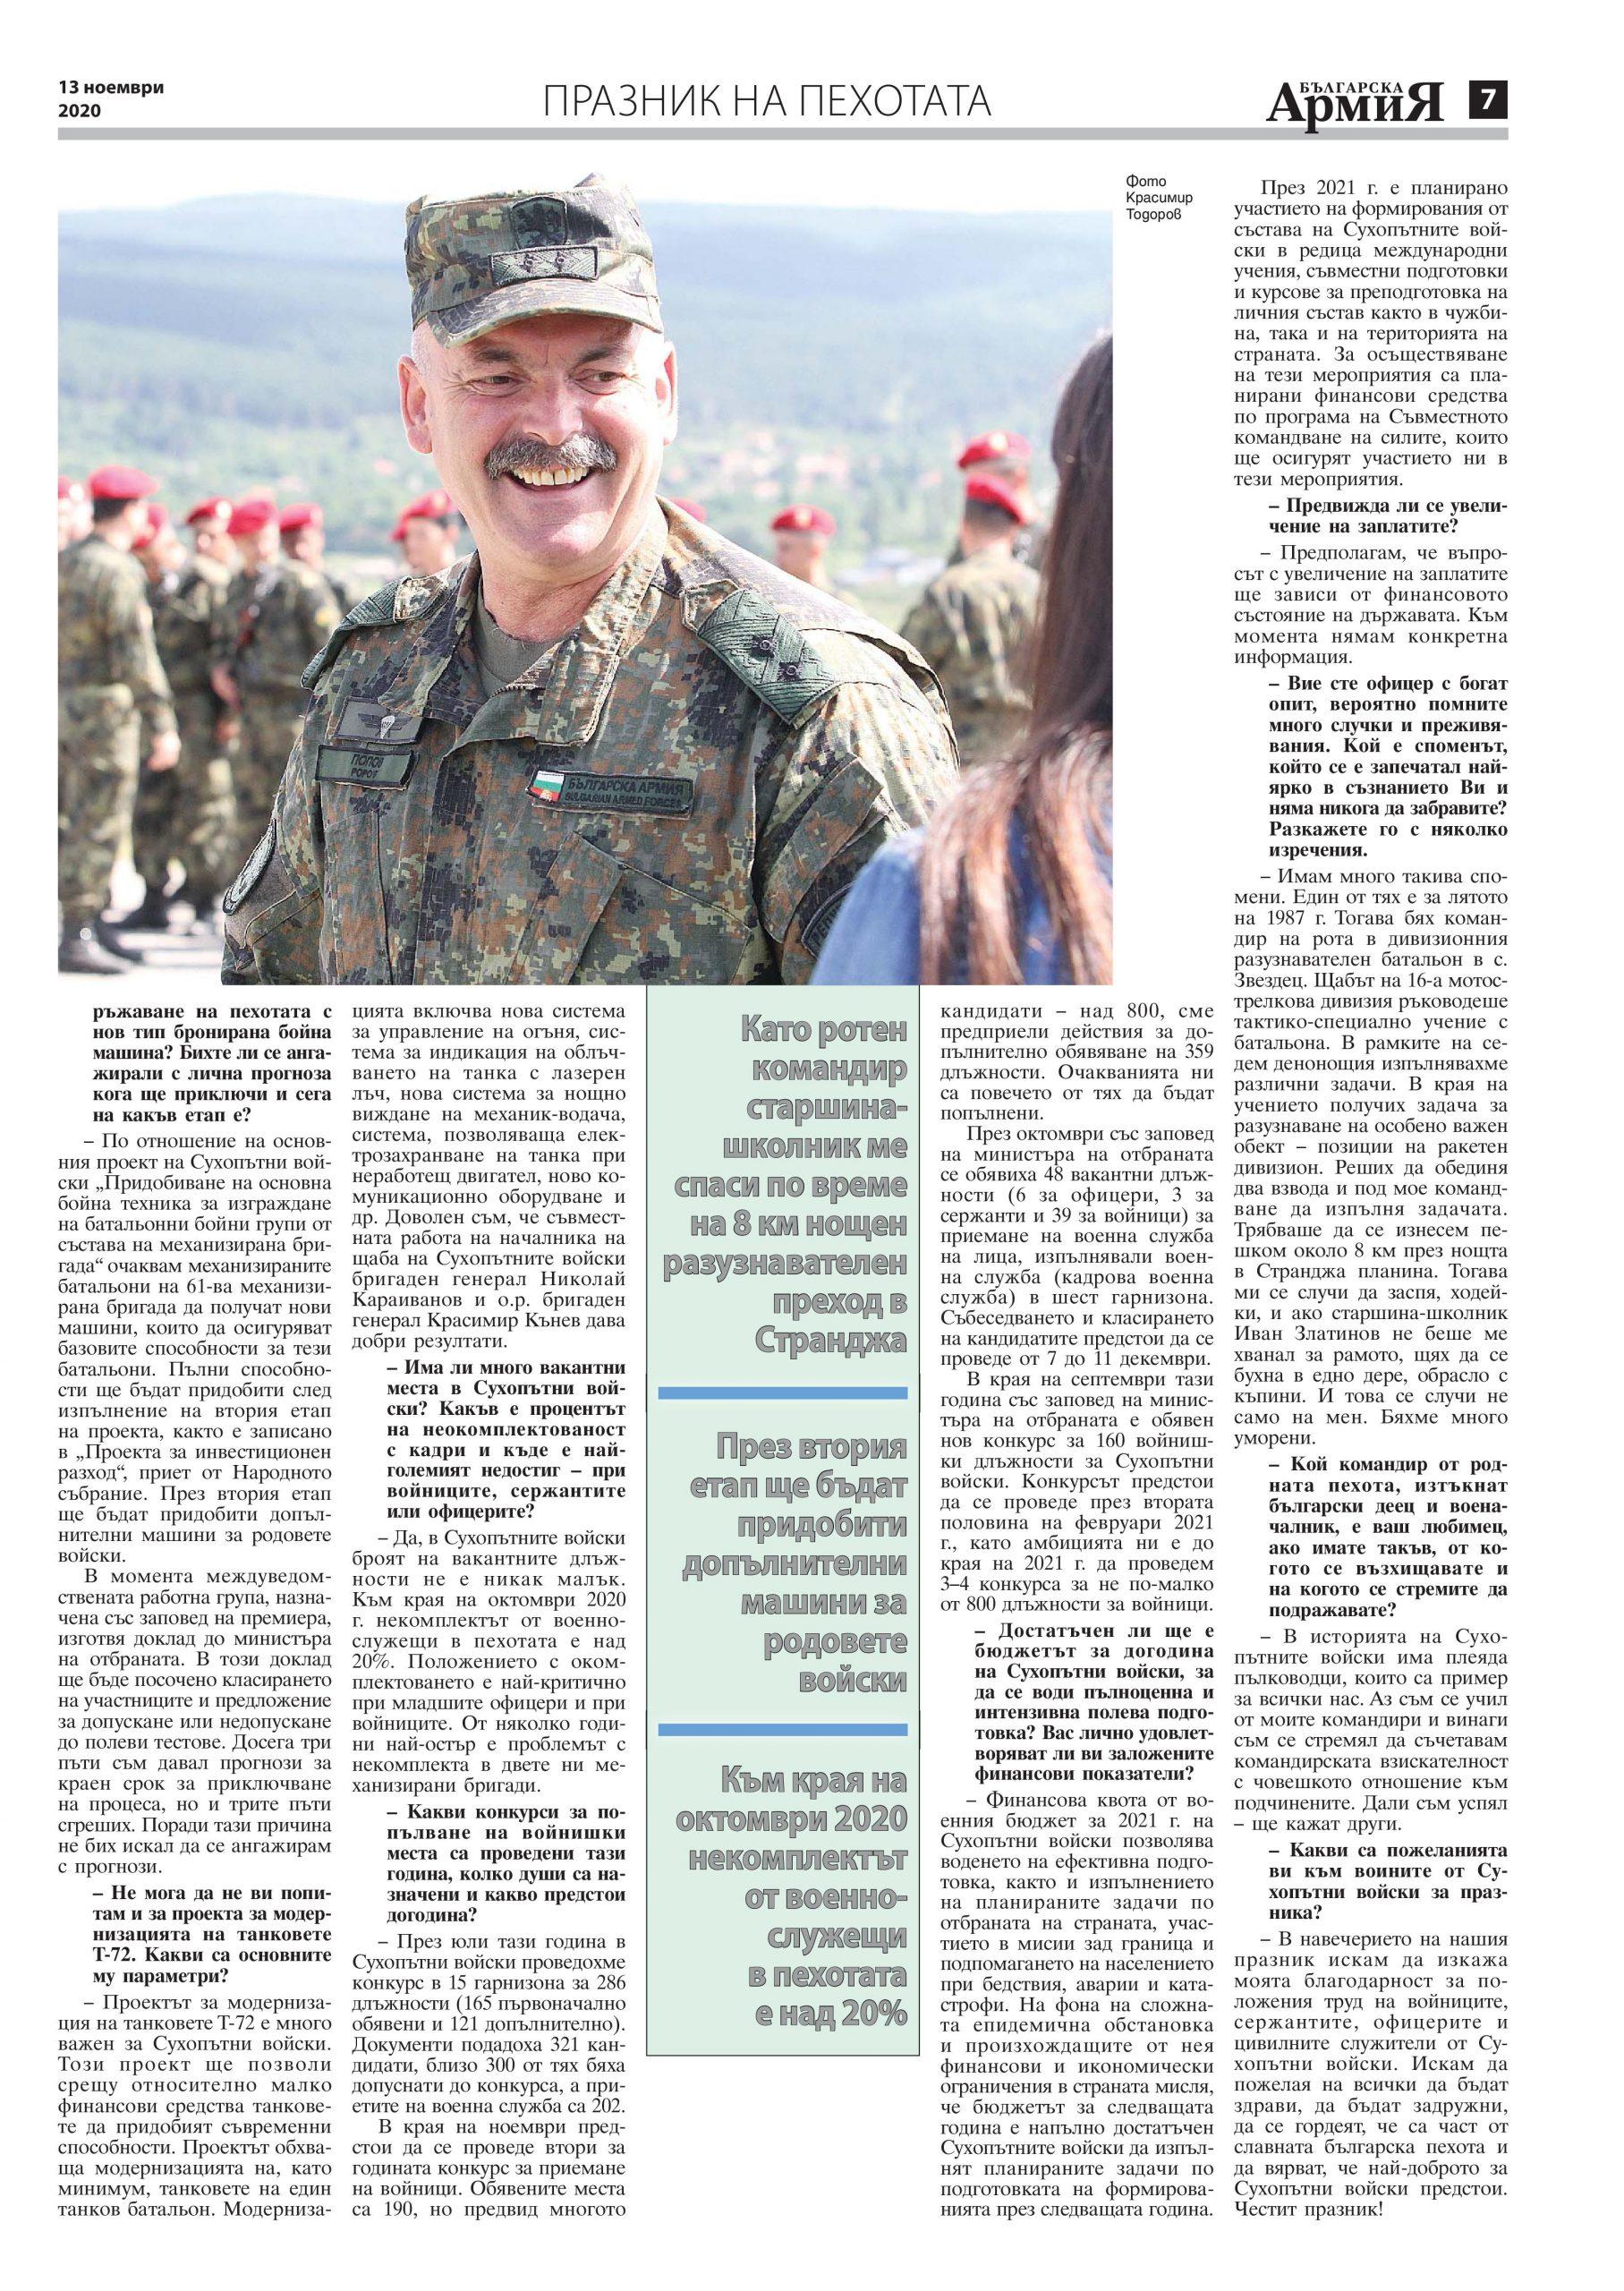 https://armymedia.bg/wp-content/uploads/2015/06/07-47-scaled.jpg